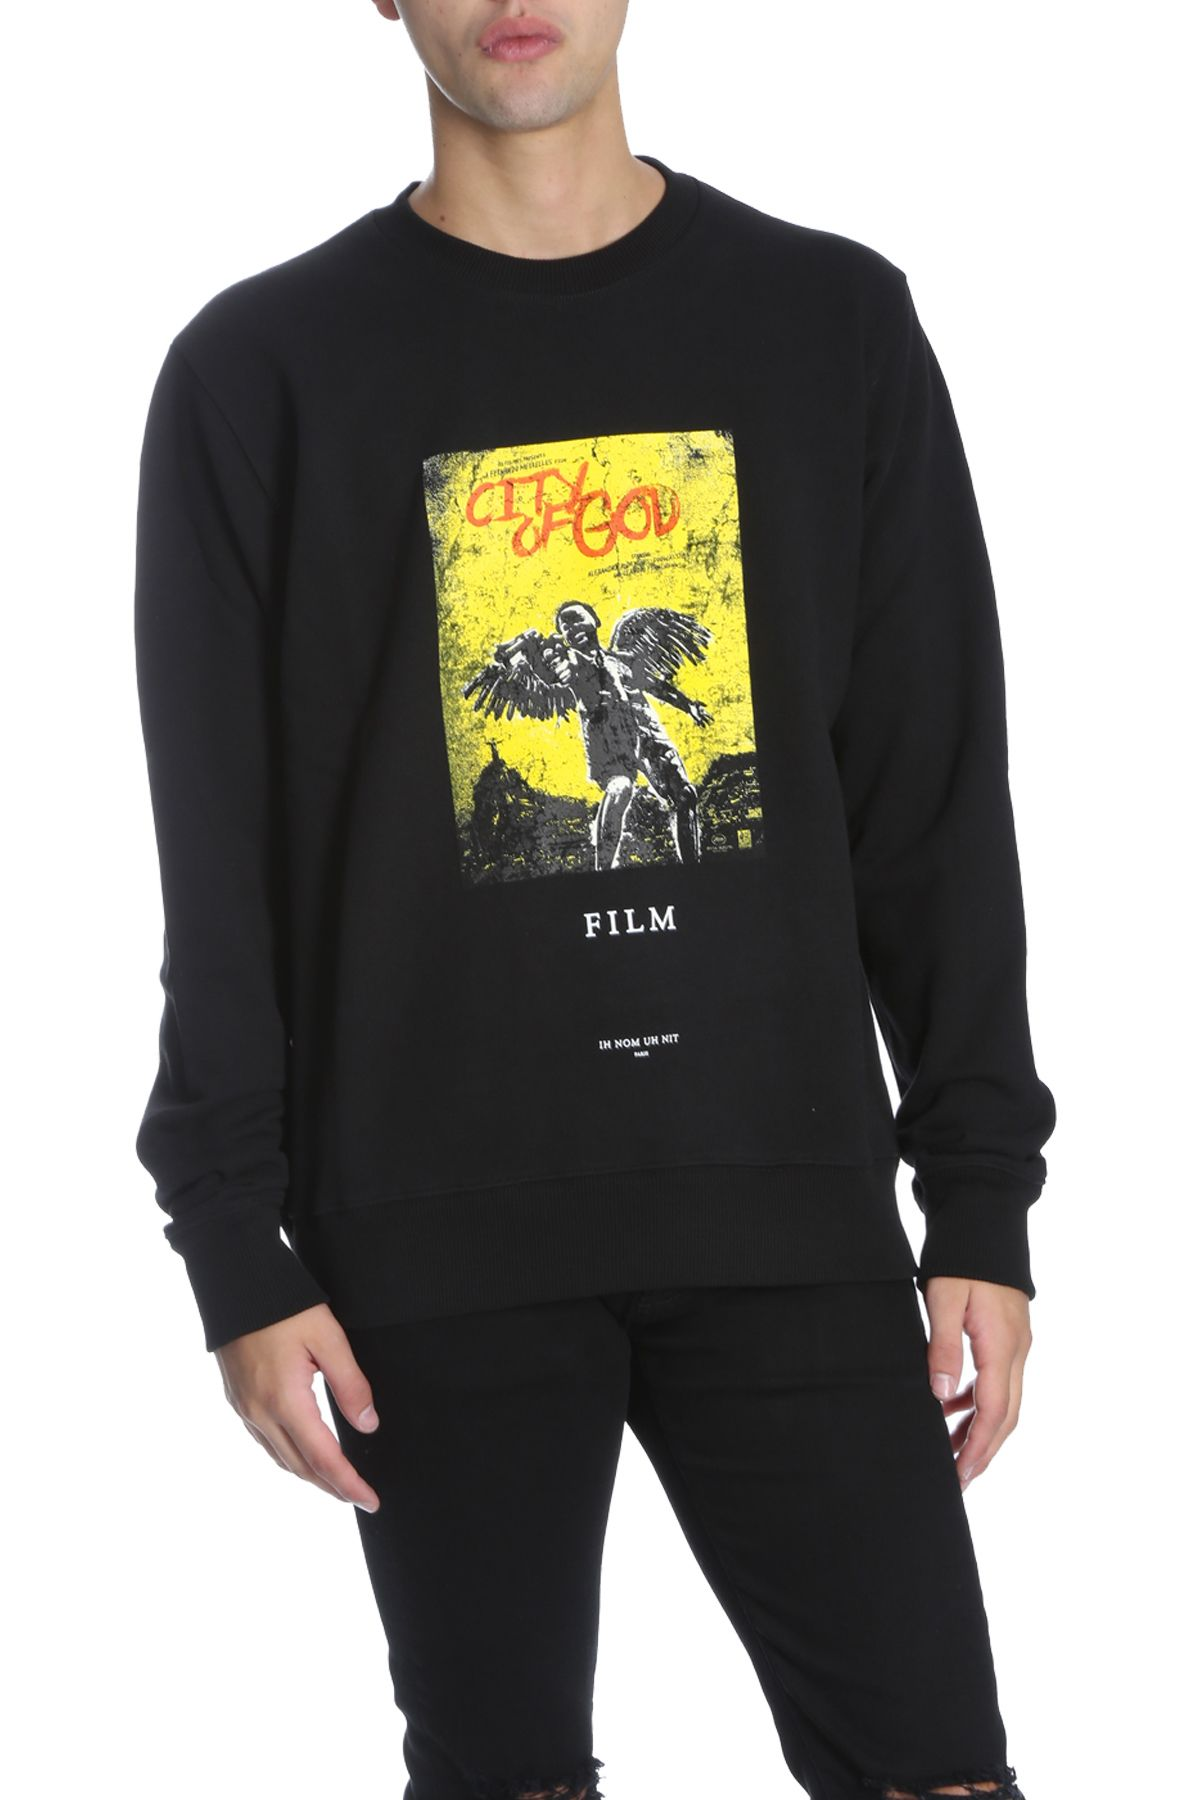 IH NOM UH NIT Fleece in Black